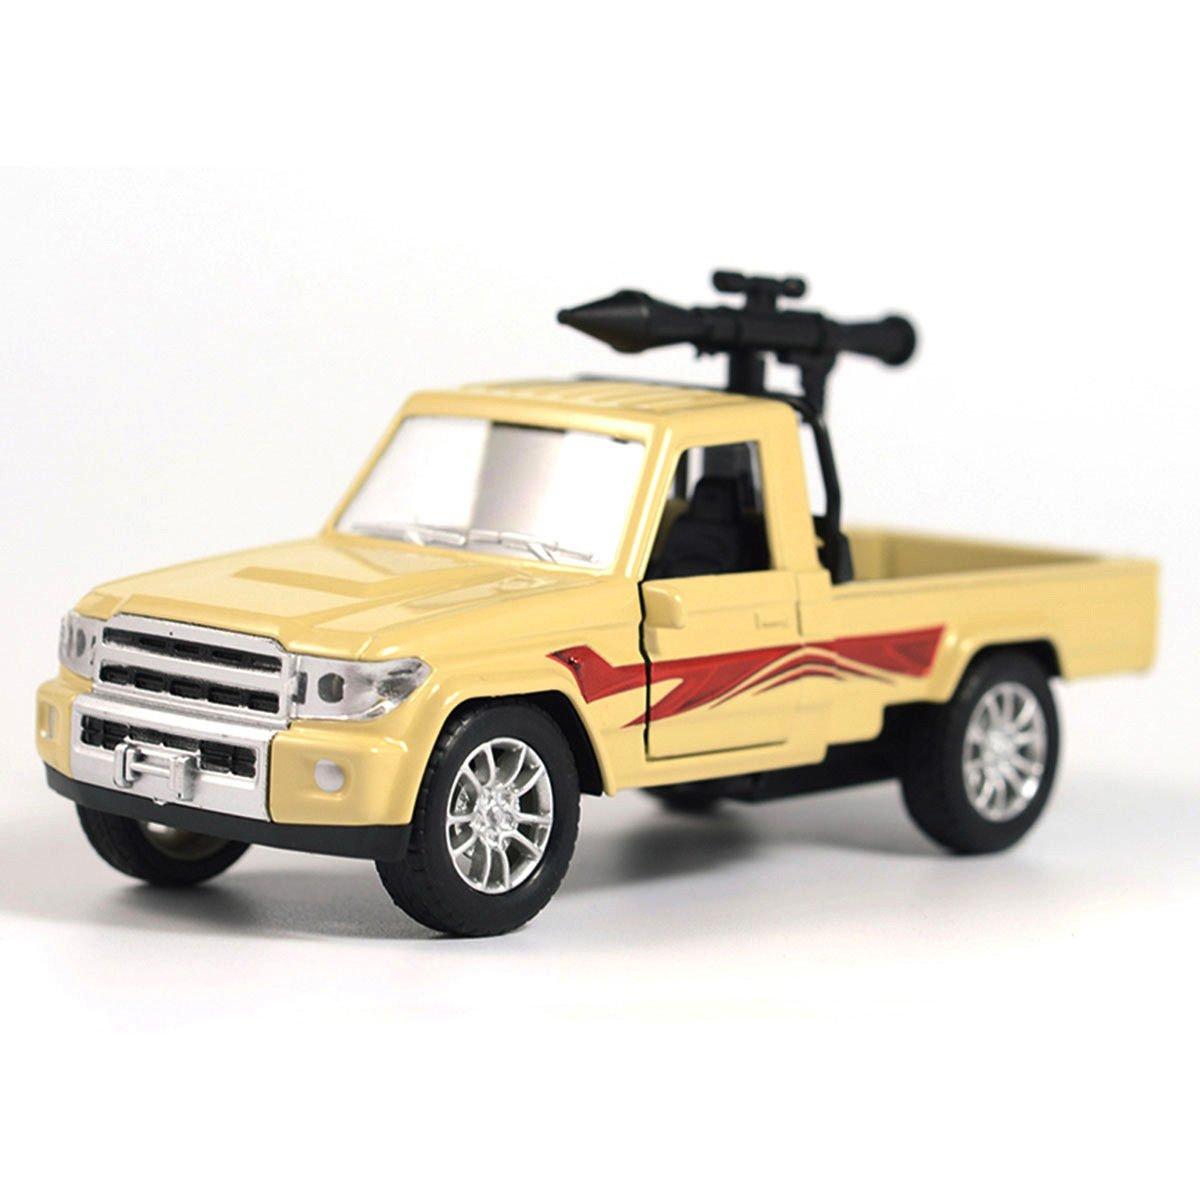 1:28 Military Pickup Truck w/ Antiaircraft Missile Car Model Diecast Kids Boys